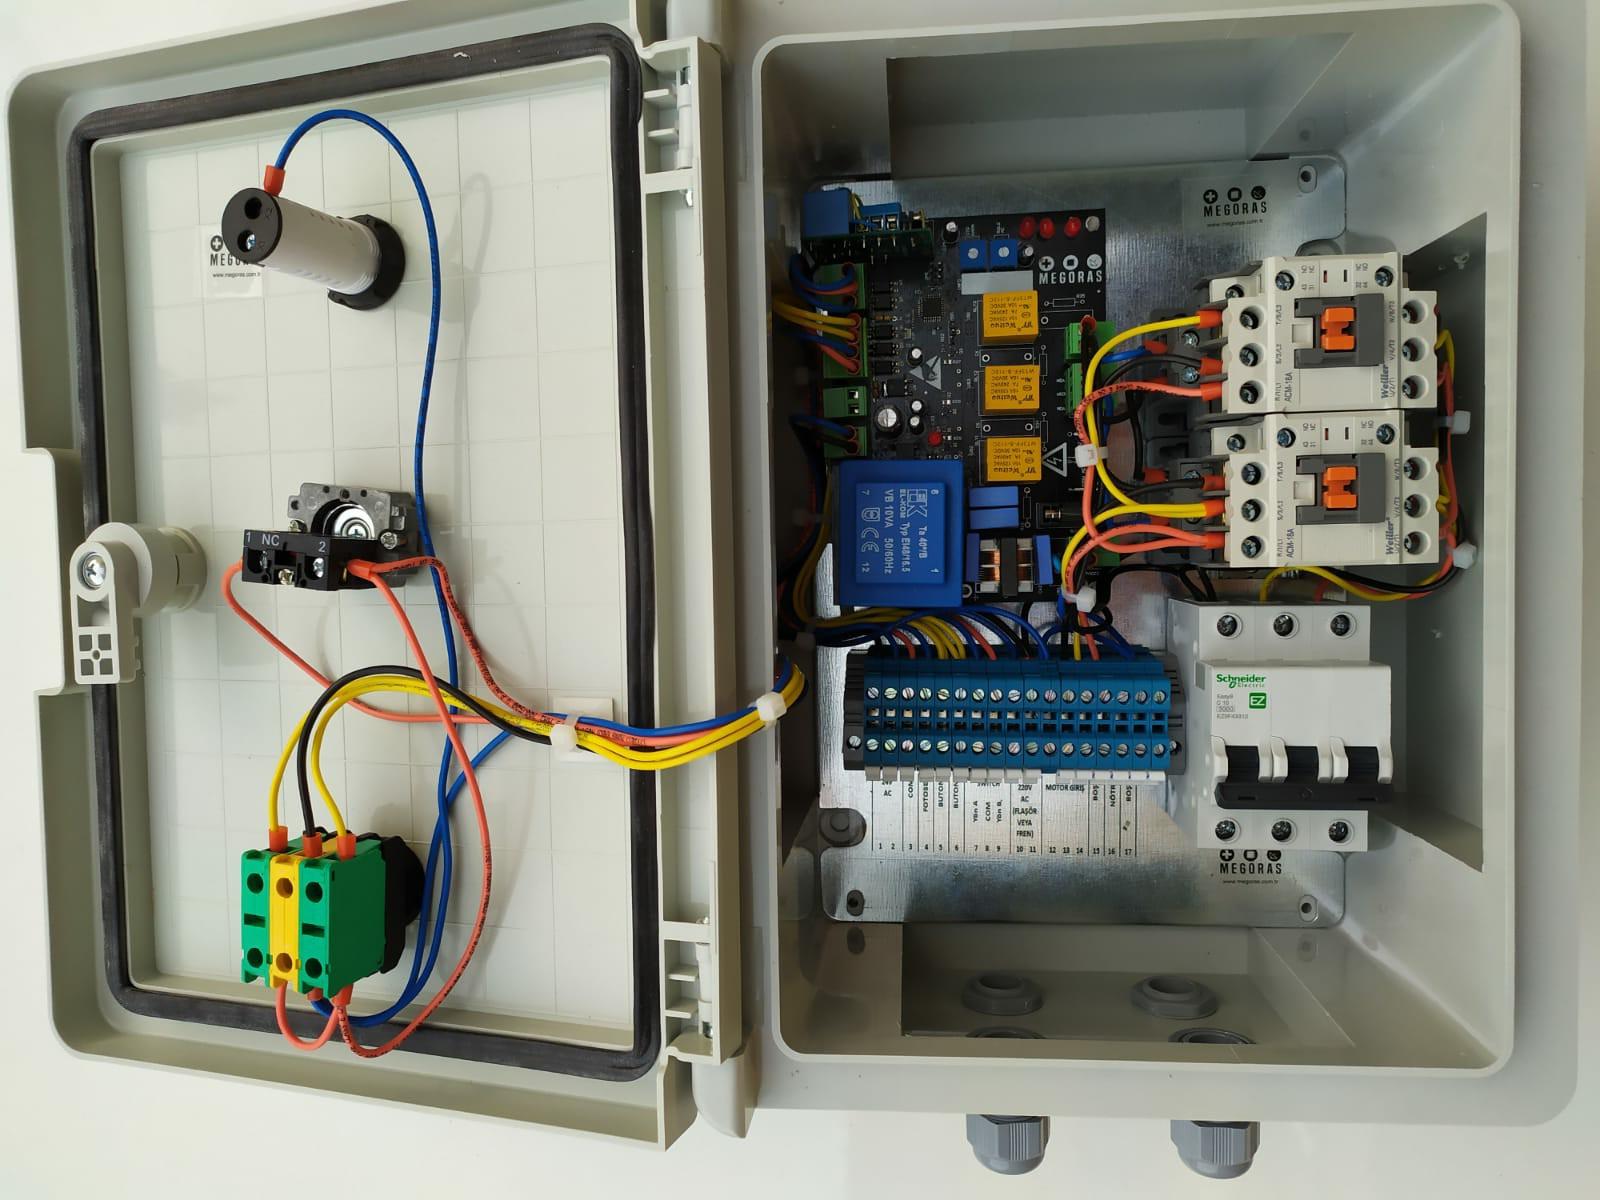 ADC102F3 Kontrol Ünitesi